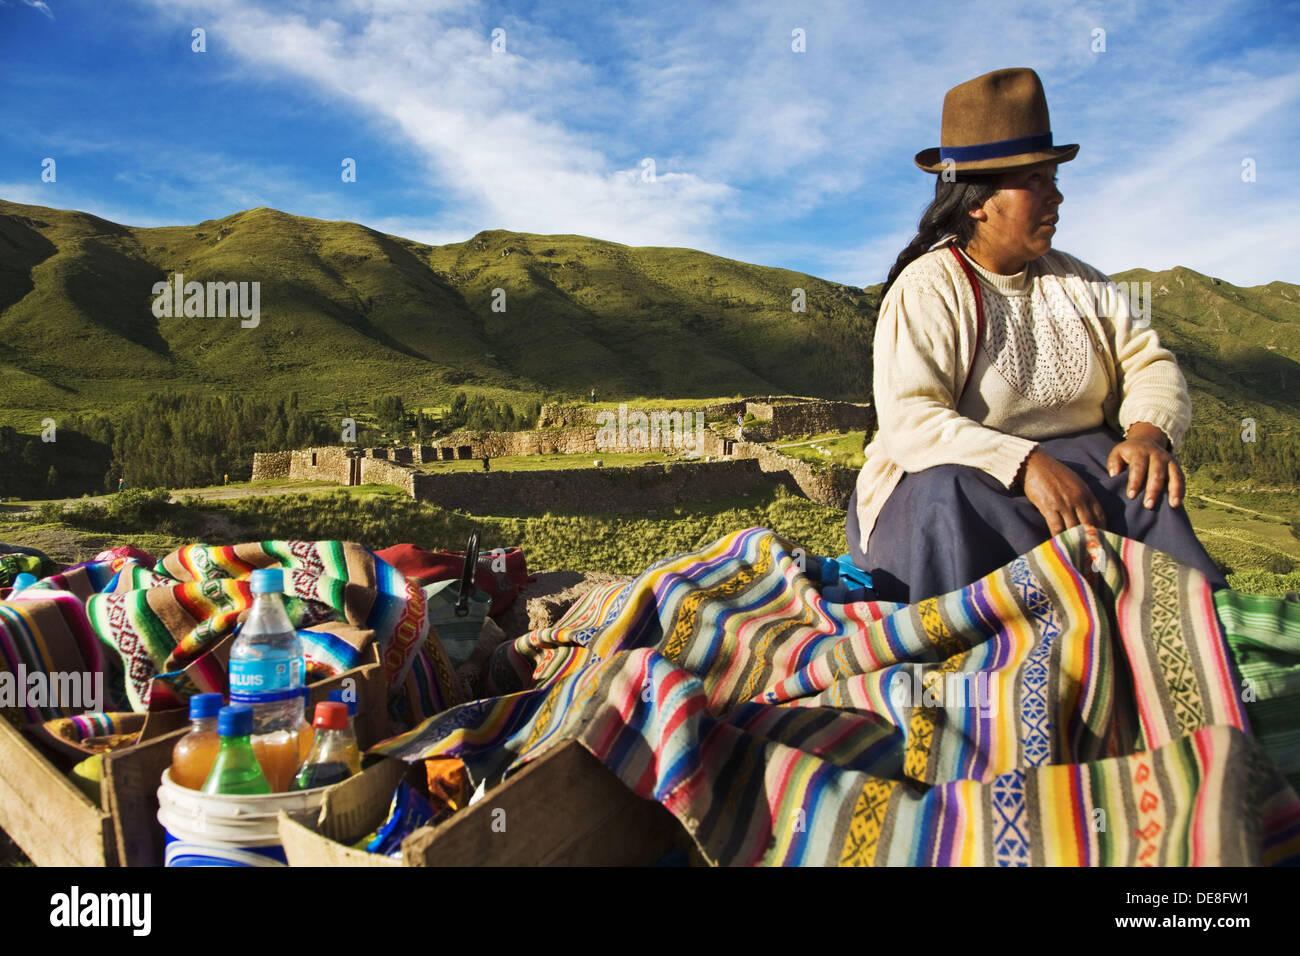 Woman, Pucapucara Incan military complex, Cusco region, Peru - Stock Image